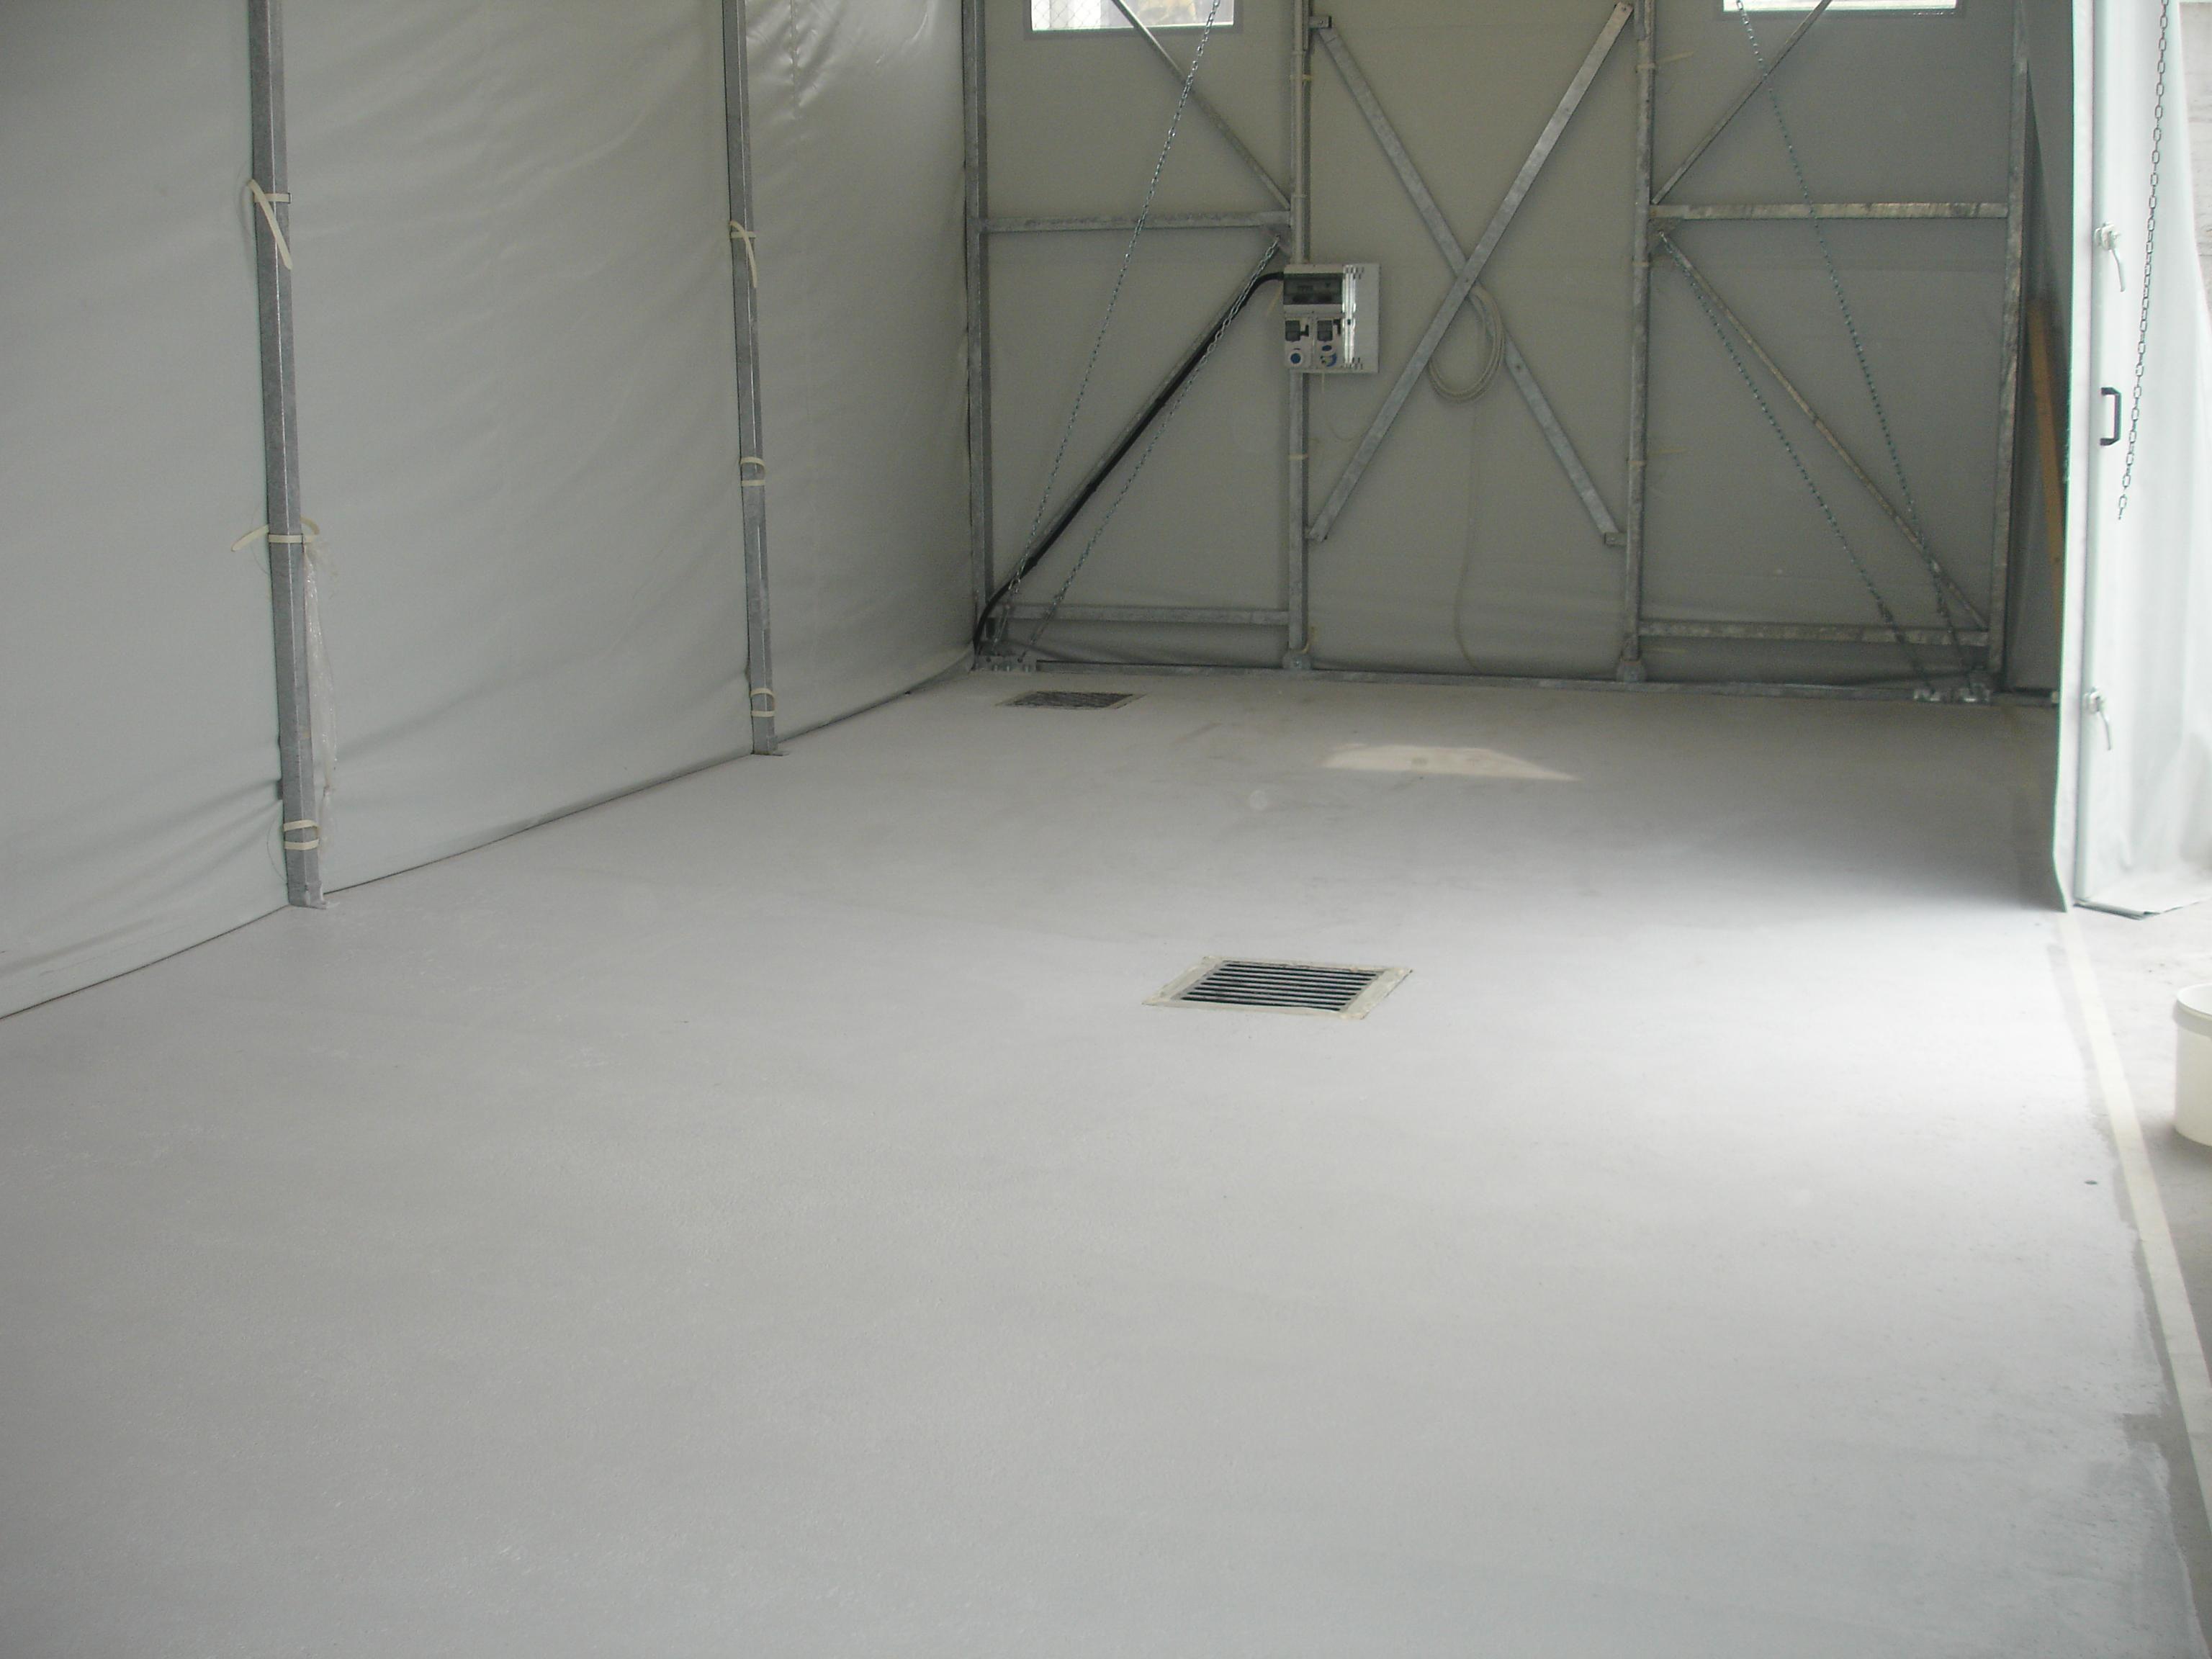 vernice epossidica per pavimenti epokoat by diasen